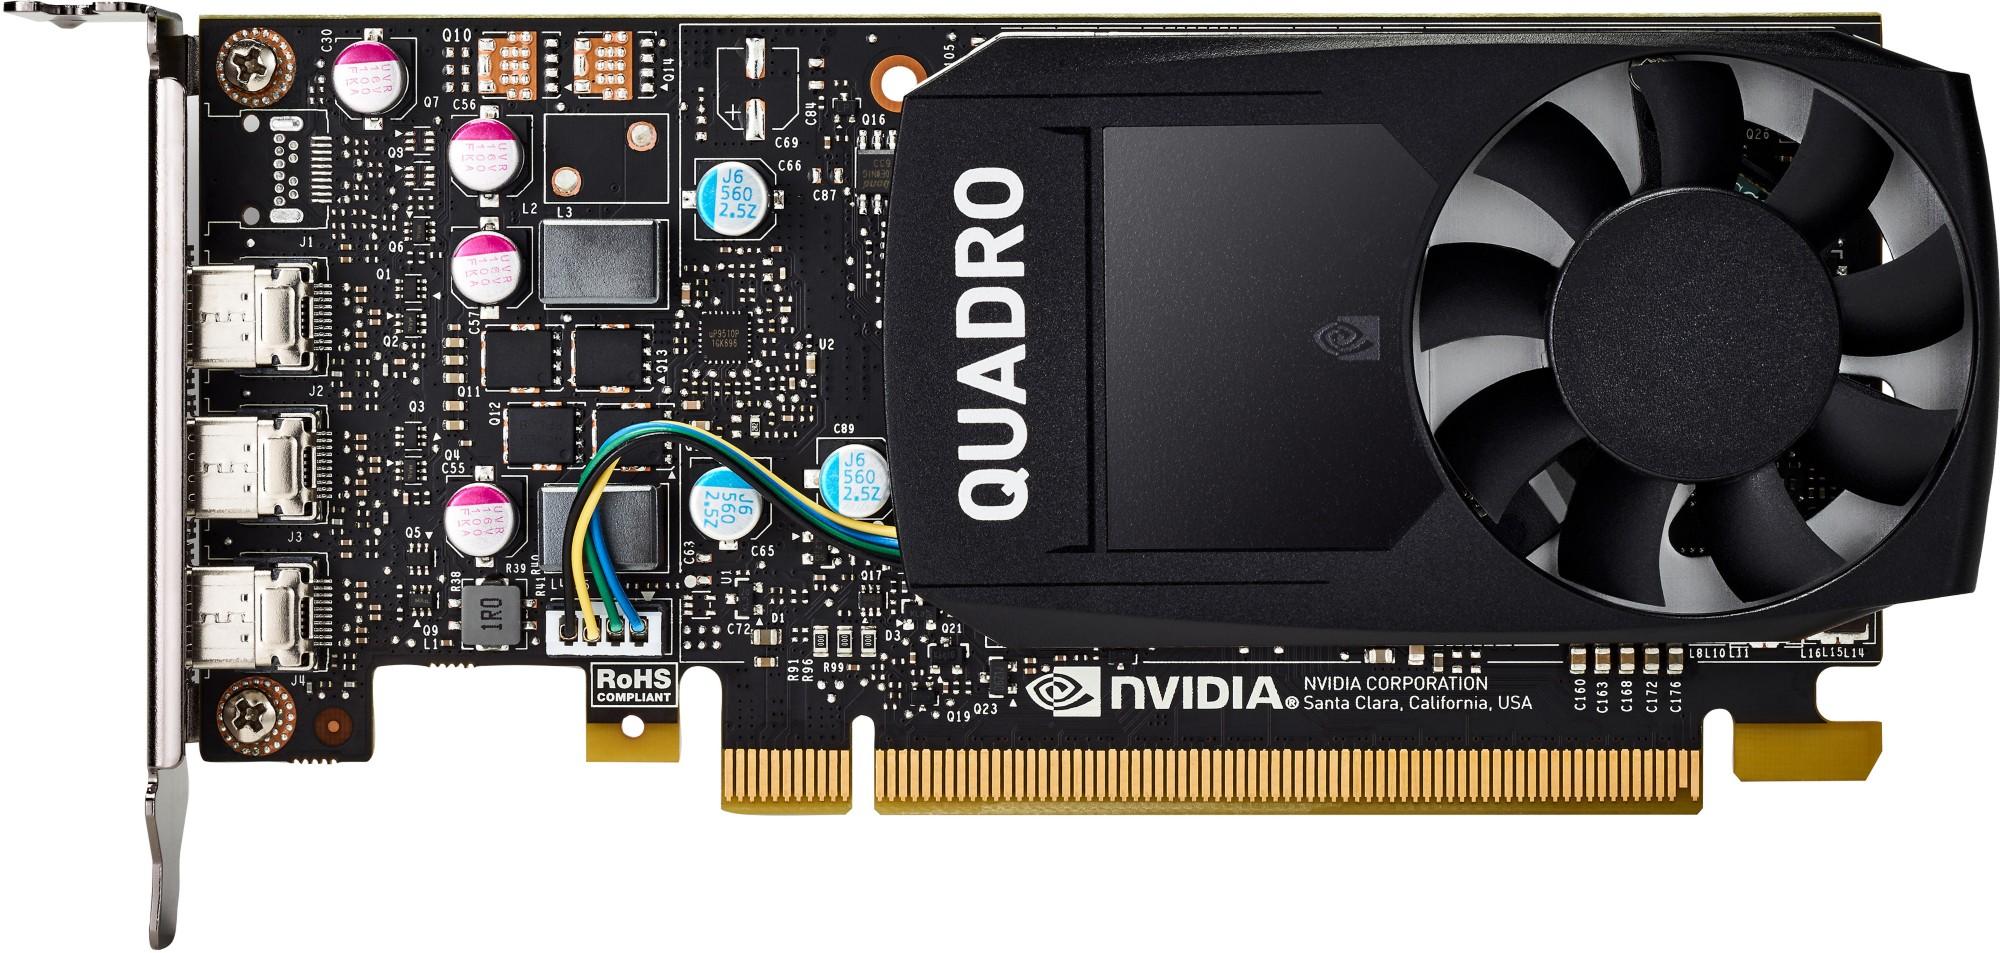 HP NVIDIA Quadro P2000 (5GB) Graphics Card